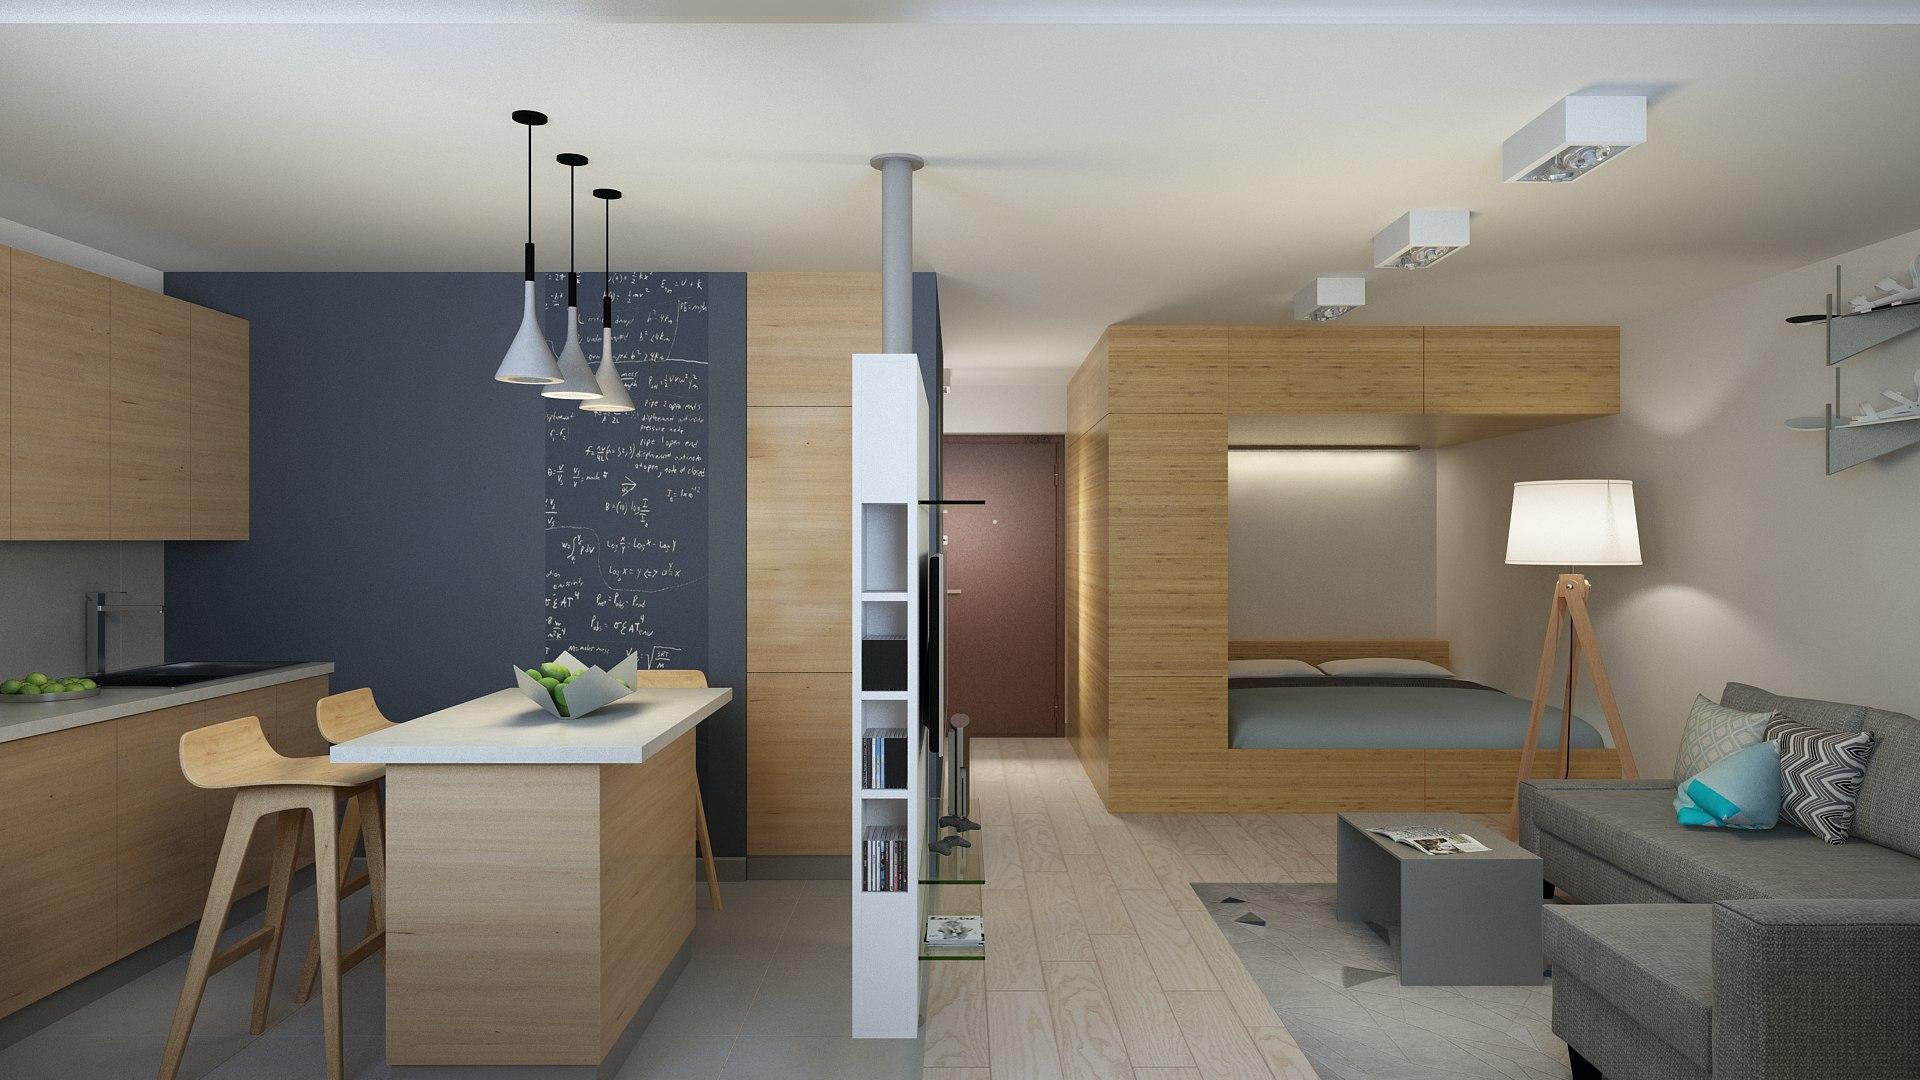 Жизнь без стен: все плюсы и минусы квартиры-студии